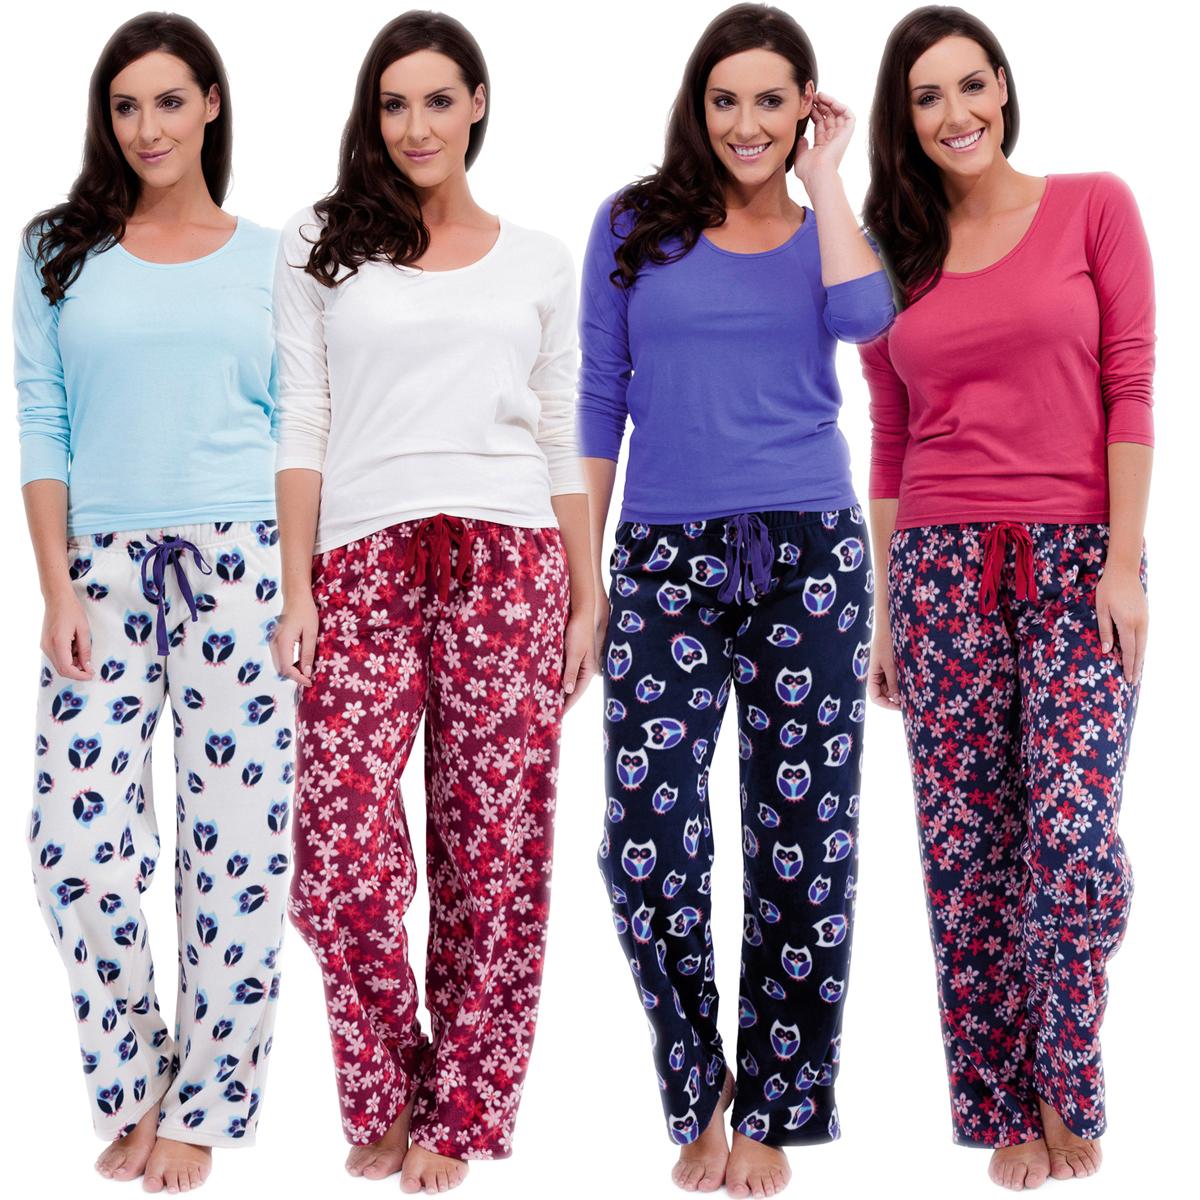 7915364a2111 Womens Warm Fleece Winter PJ Pyjama Set Night Wear PJ s Pyjamas Sets ...